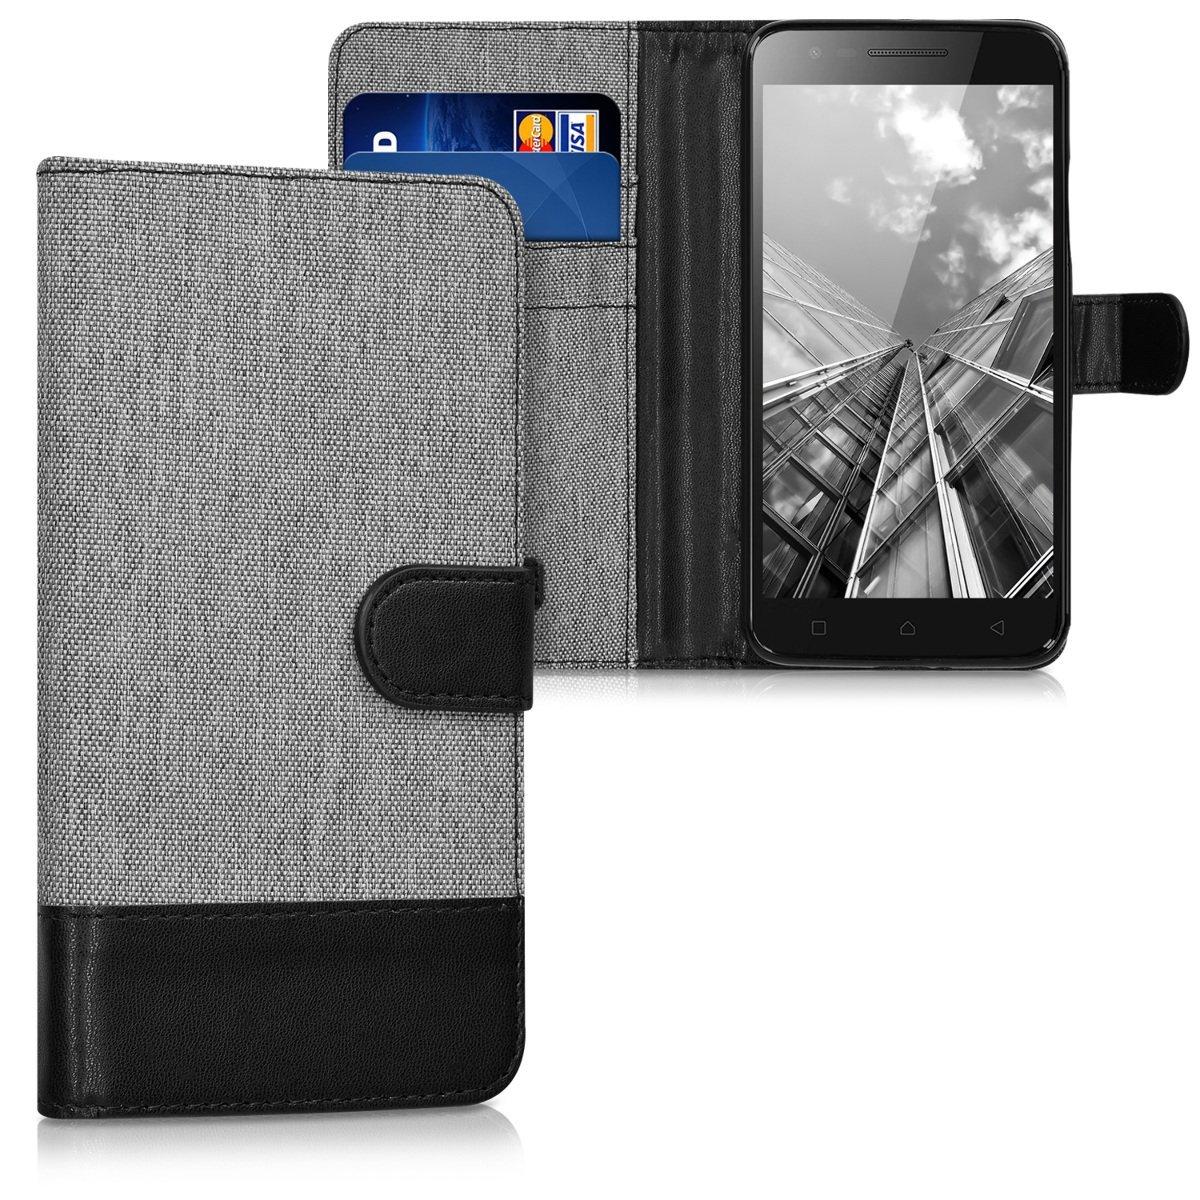 KW Θήκη - Πορτοφόλι Lenovo C2 - Grey/ Black (40503.01)